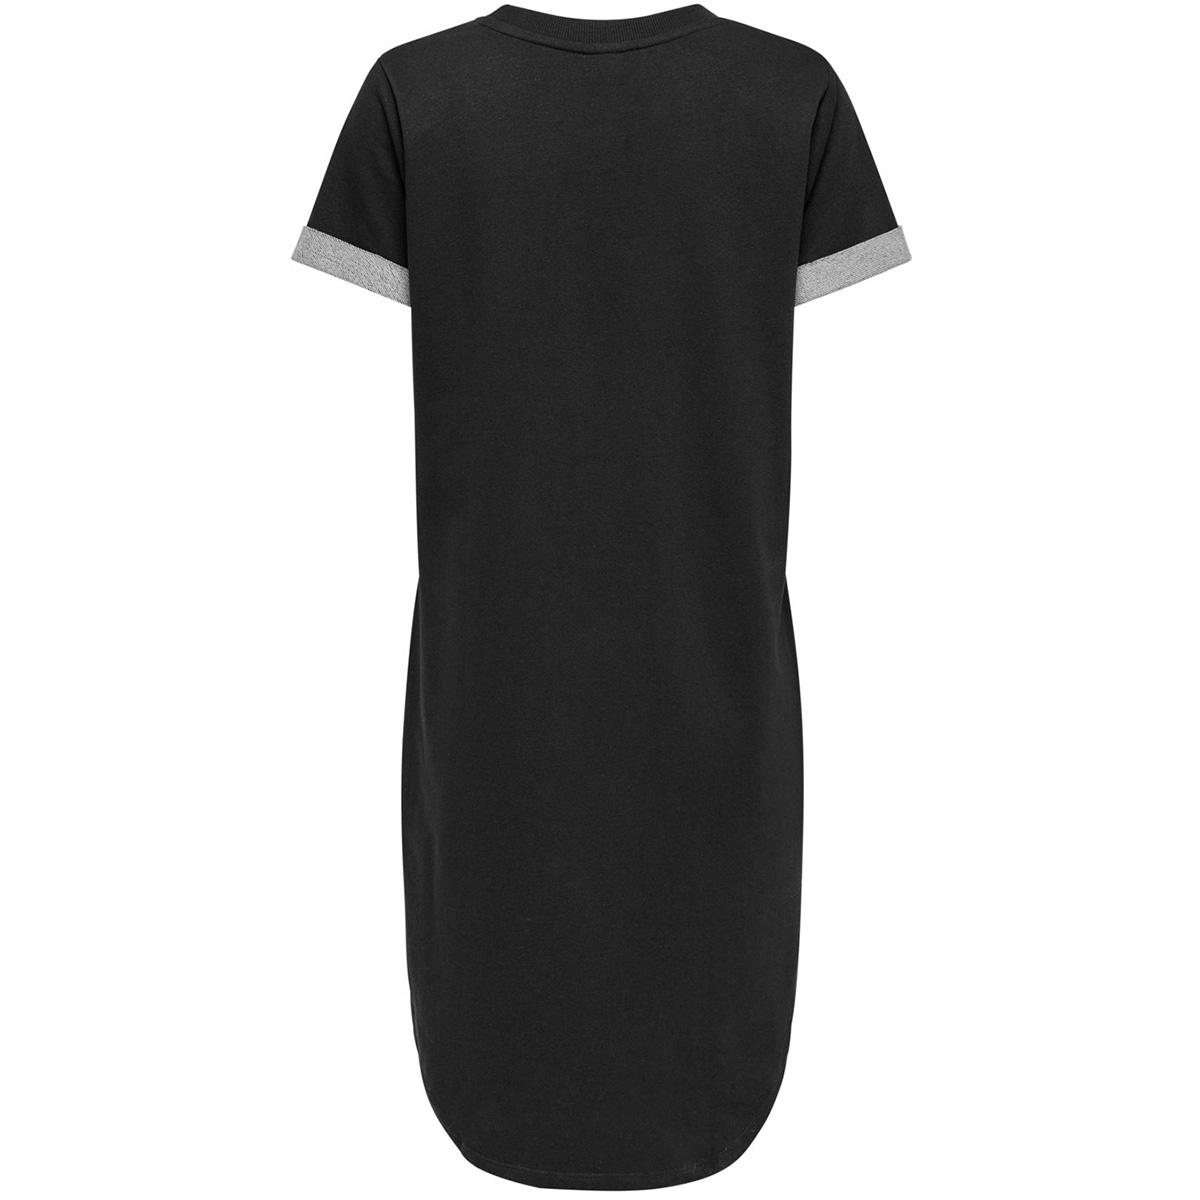 jdyivy life s/s dress jrs noos 15174793 jacqueline de yong jurk black